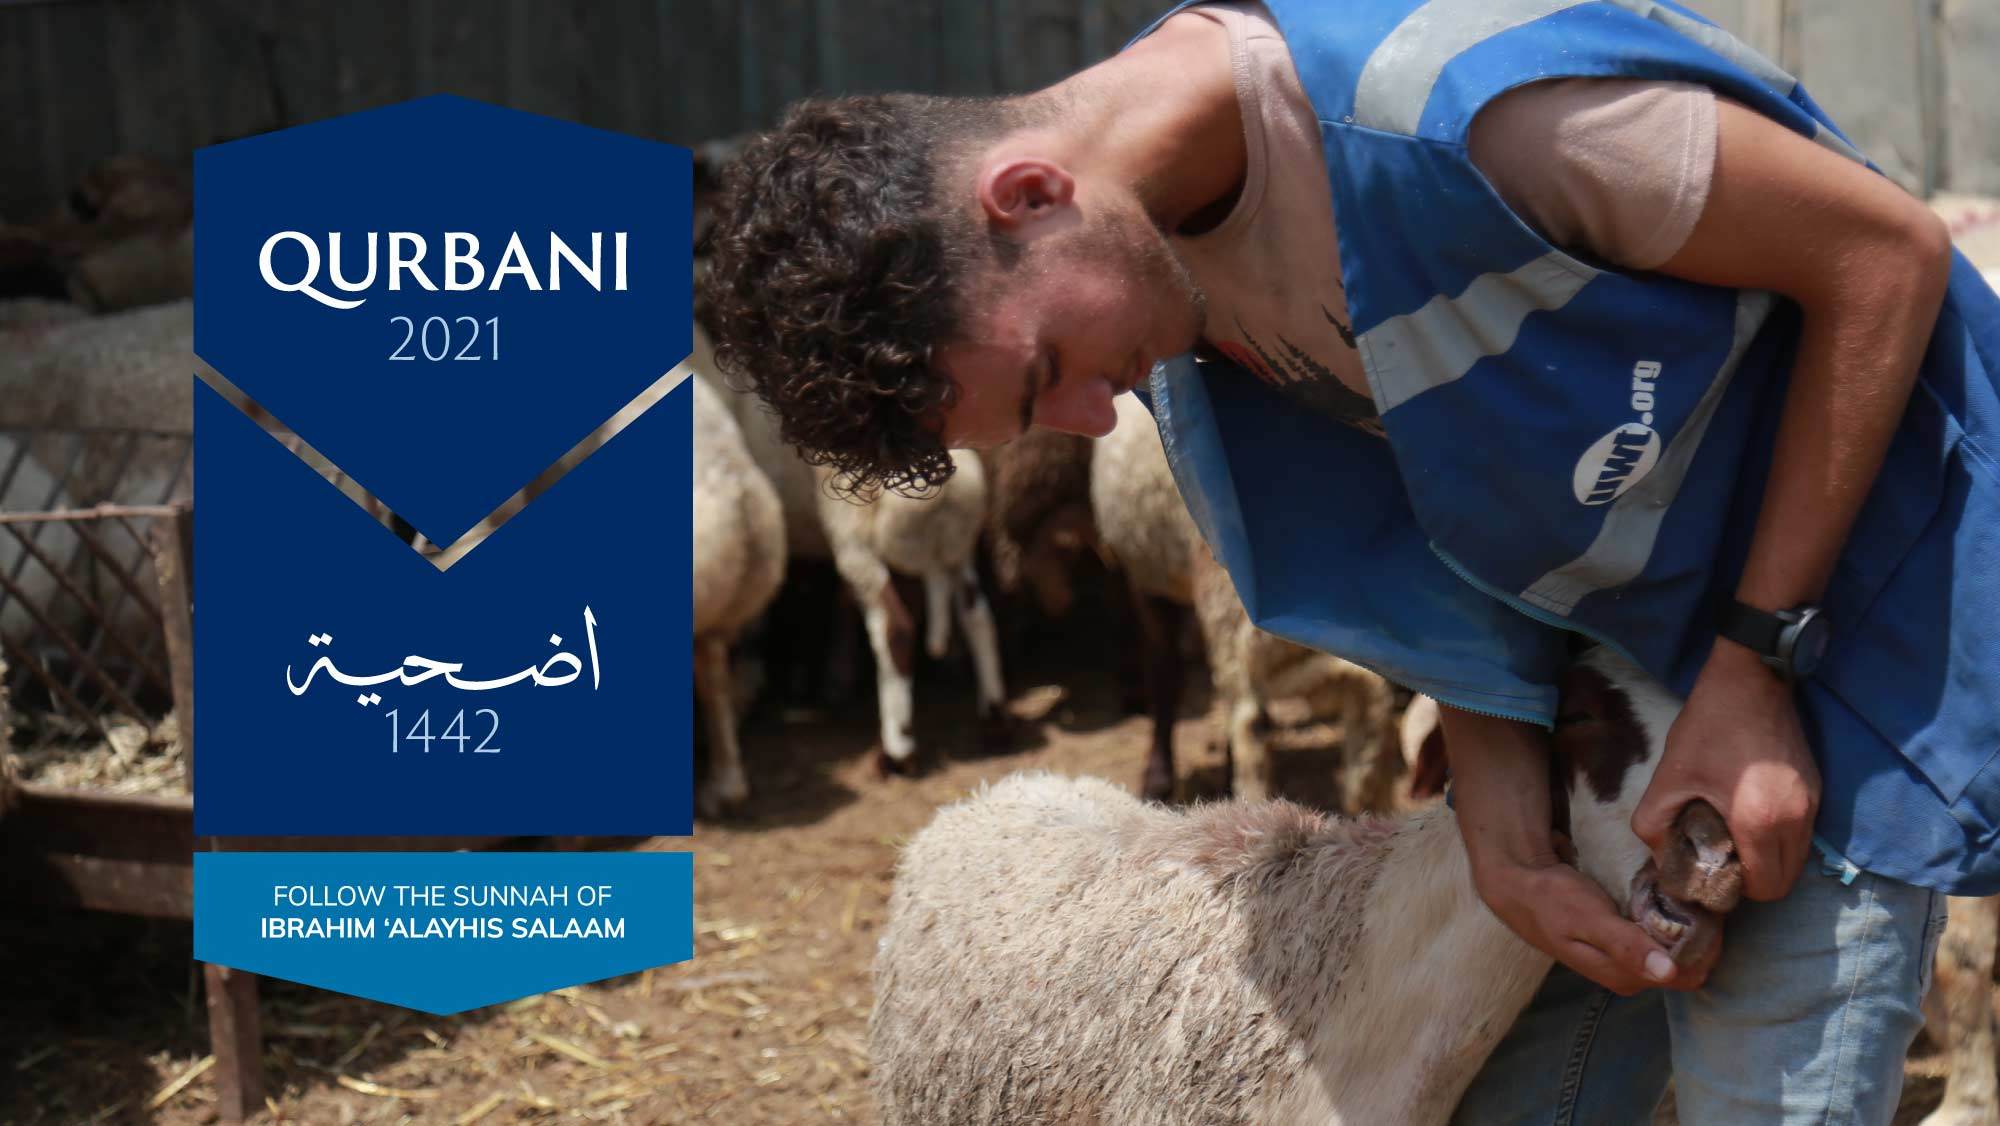 Qurbani 2021 Follow the Sunnah